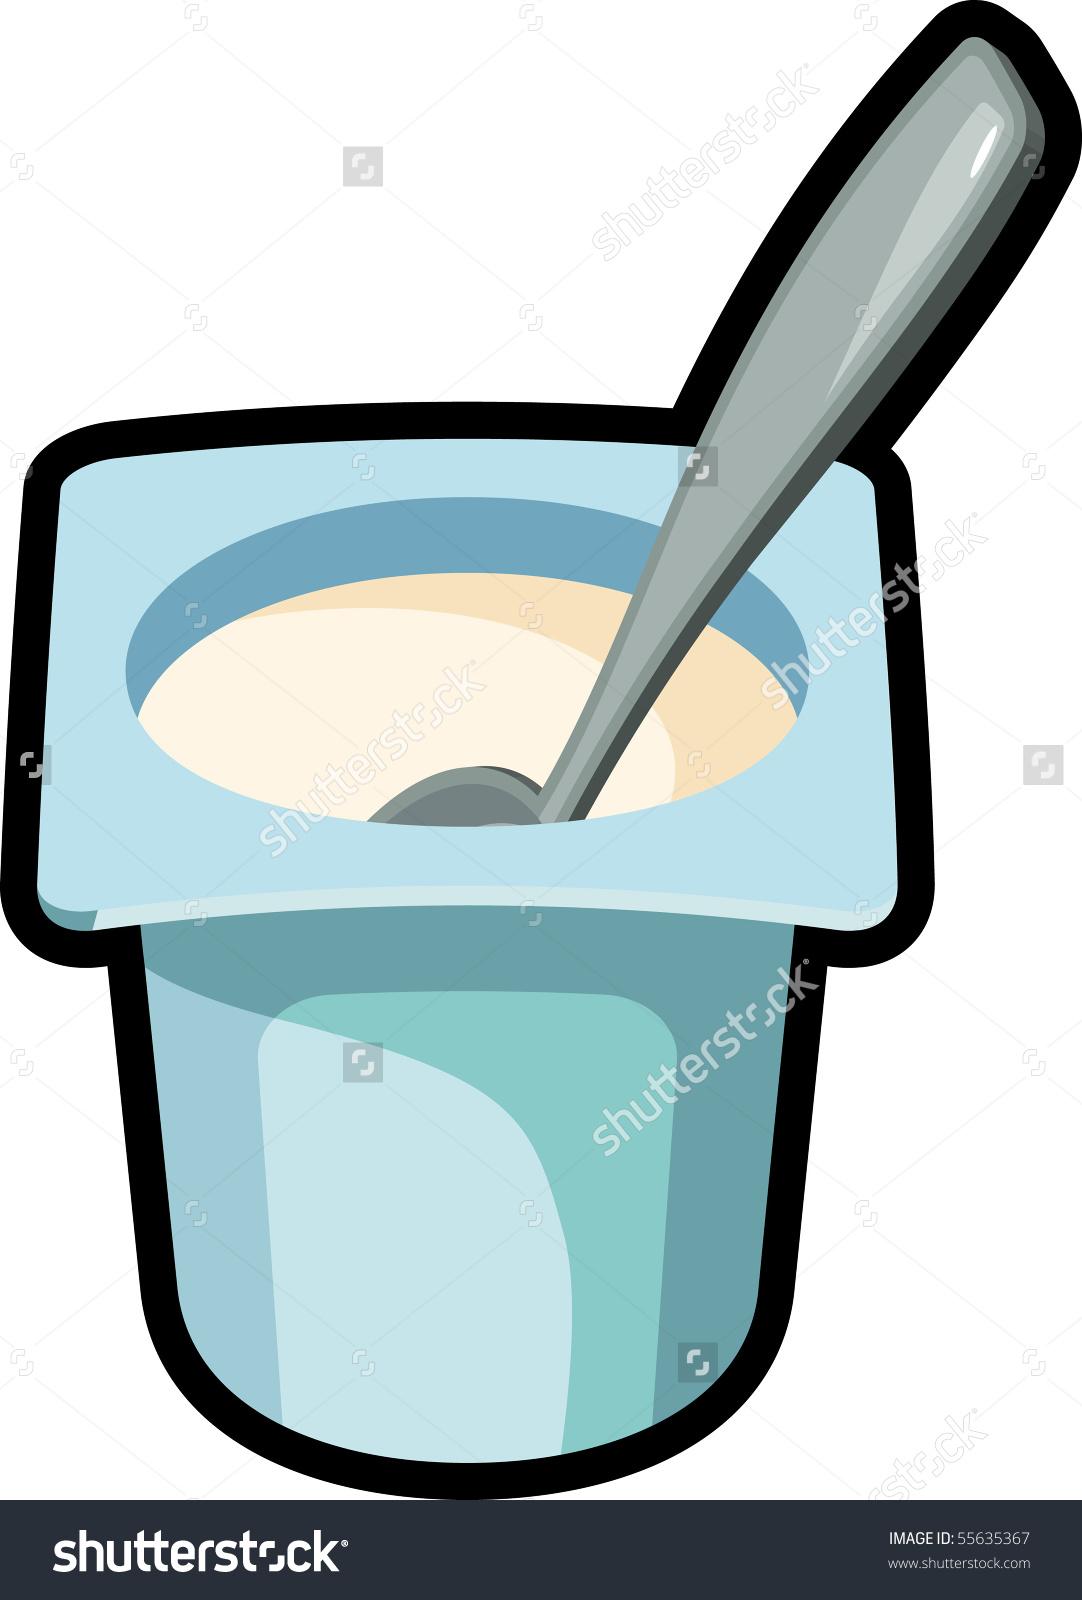 Yogurt clipart plain yogurt. Free download best on